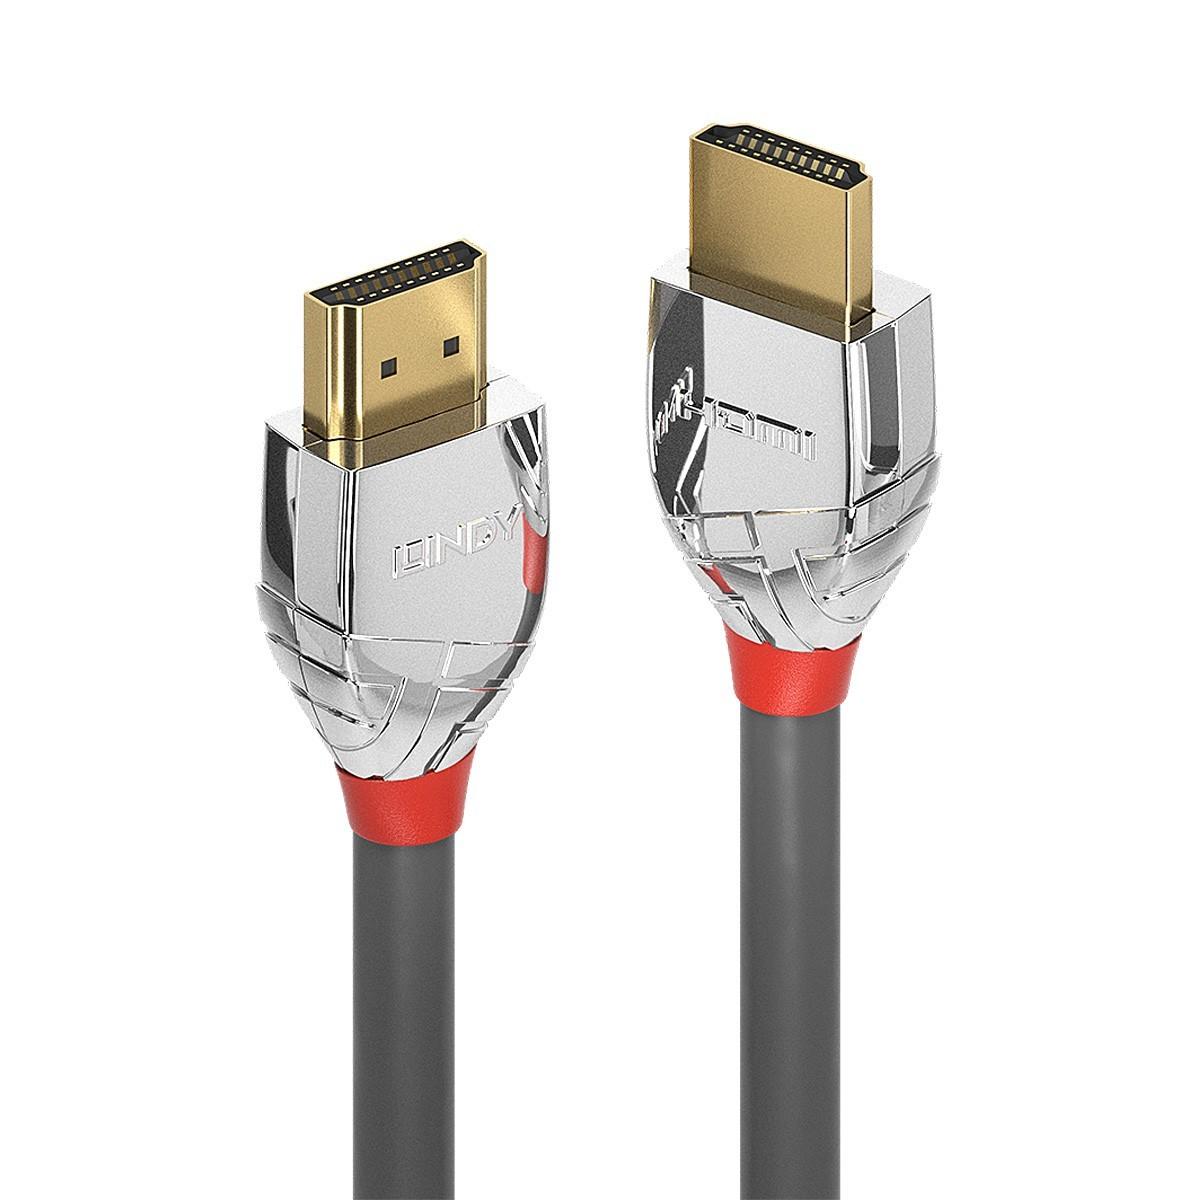 LINDY CROMO LINE Câble HDMI 2.0 High Speed Triple Blindage Plaqué Or 24k 1m